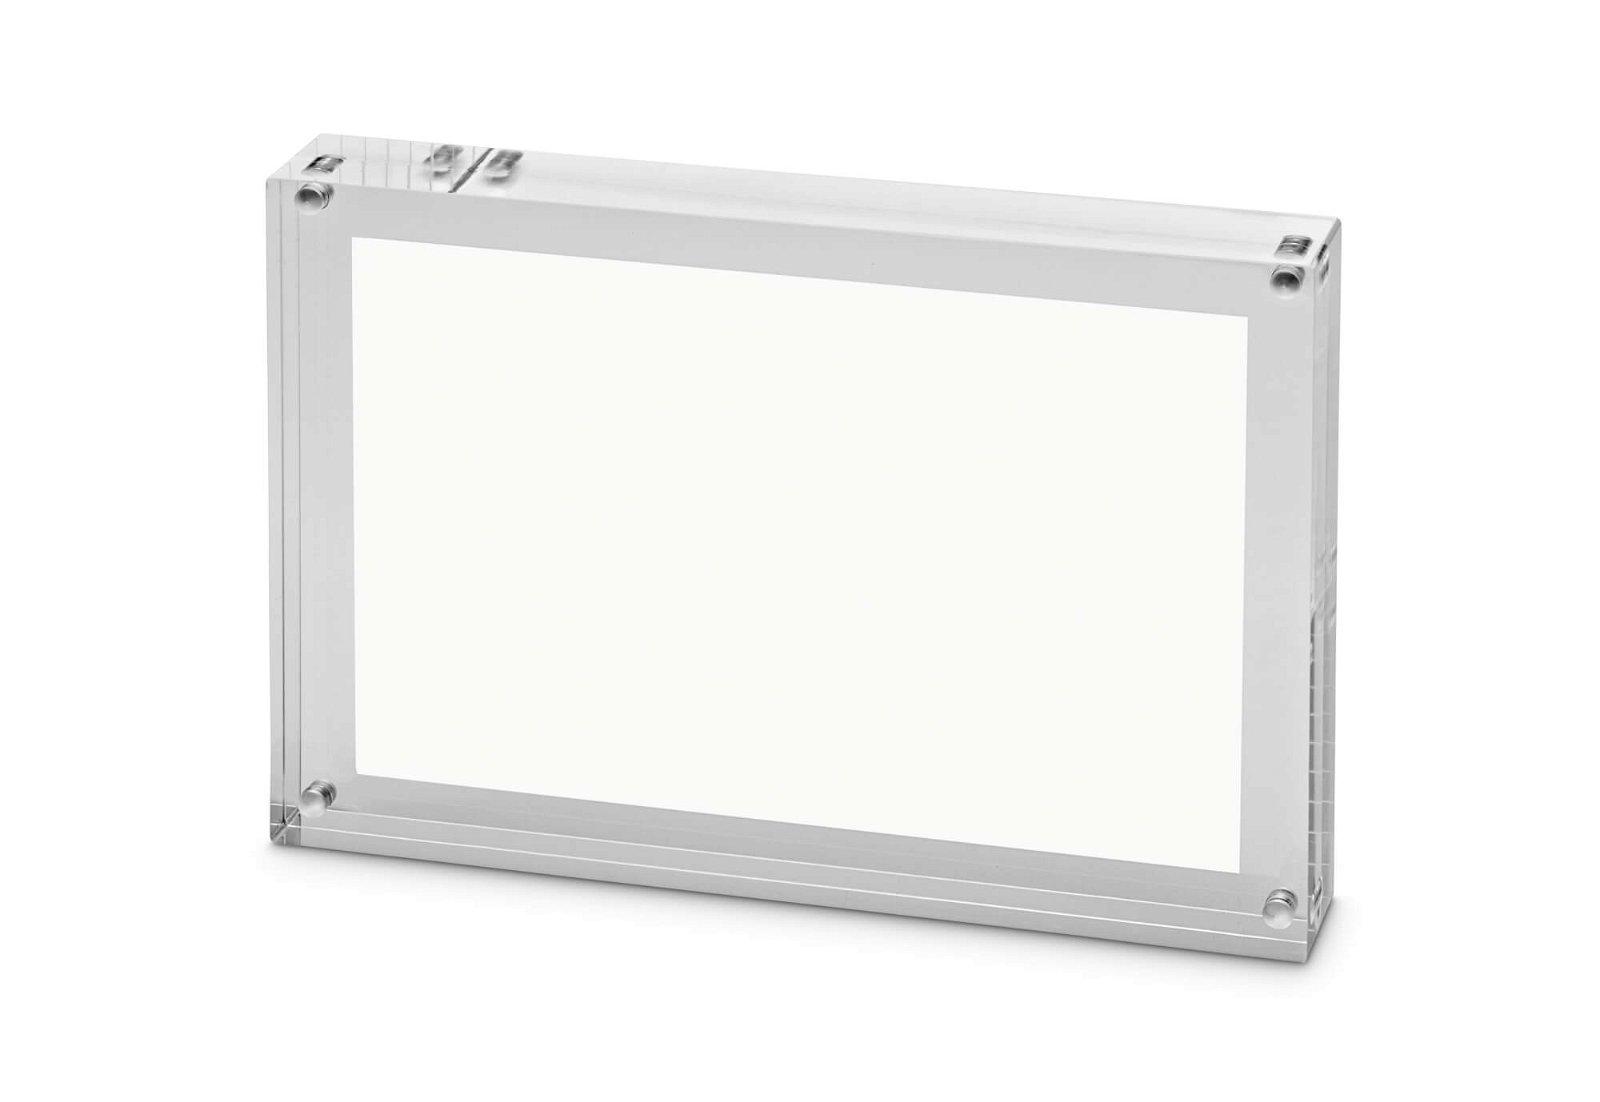 Bilderhalter Acryl, 14,9 x 21,1 x 3 cm, glasklar